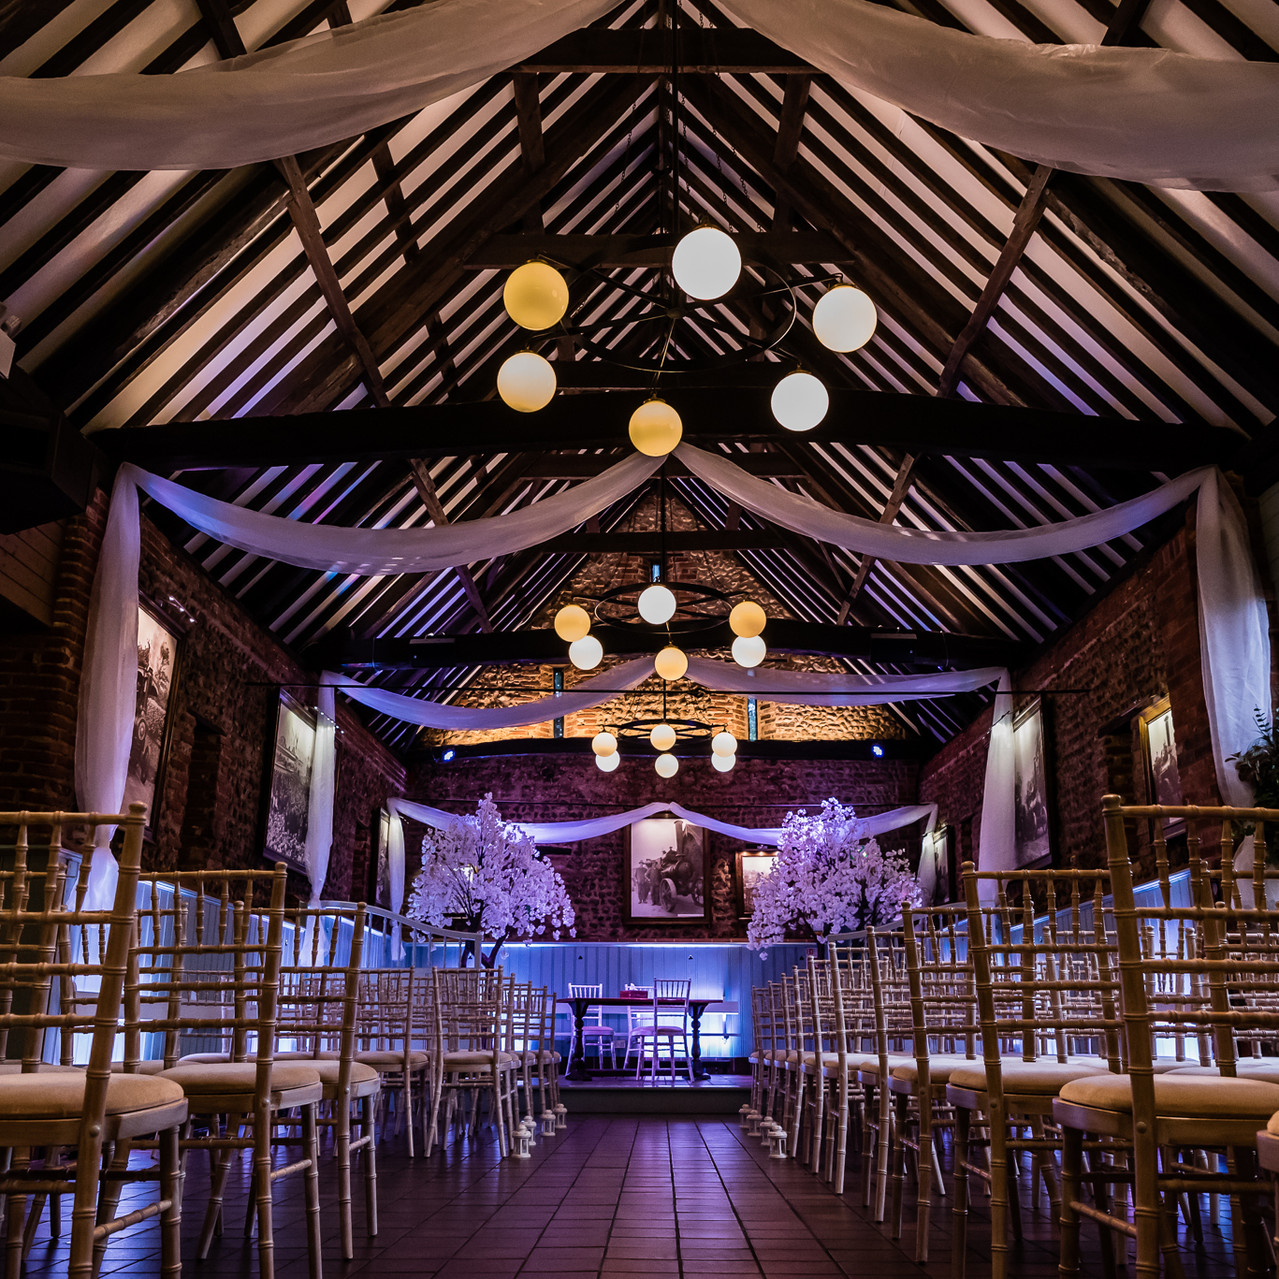 Fay Wedding - Thursford Collection at the Garden Pavilion, Norfolk. Wedding Hall